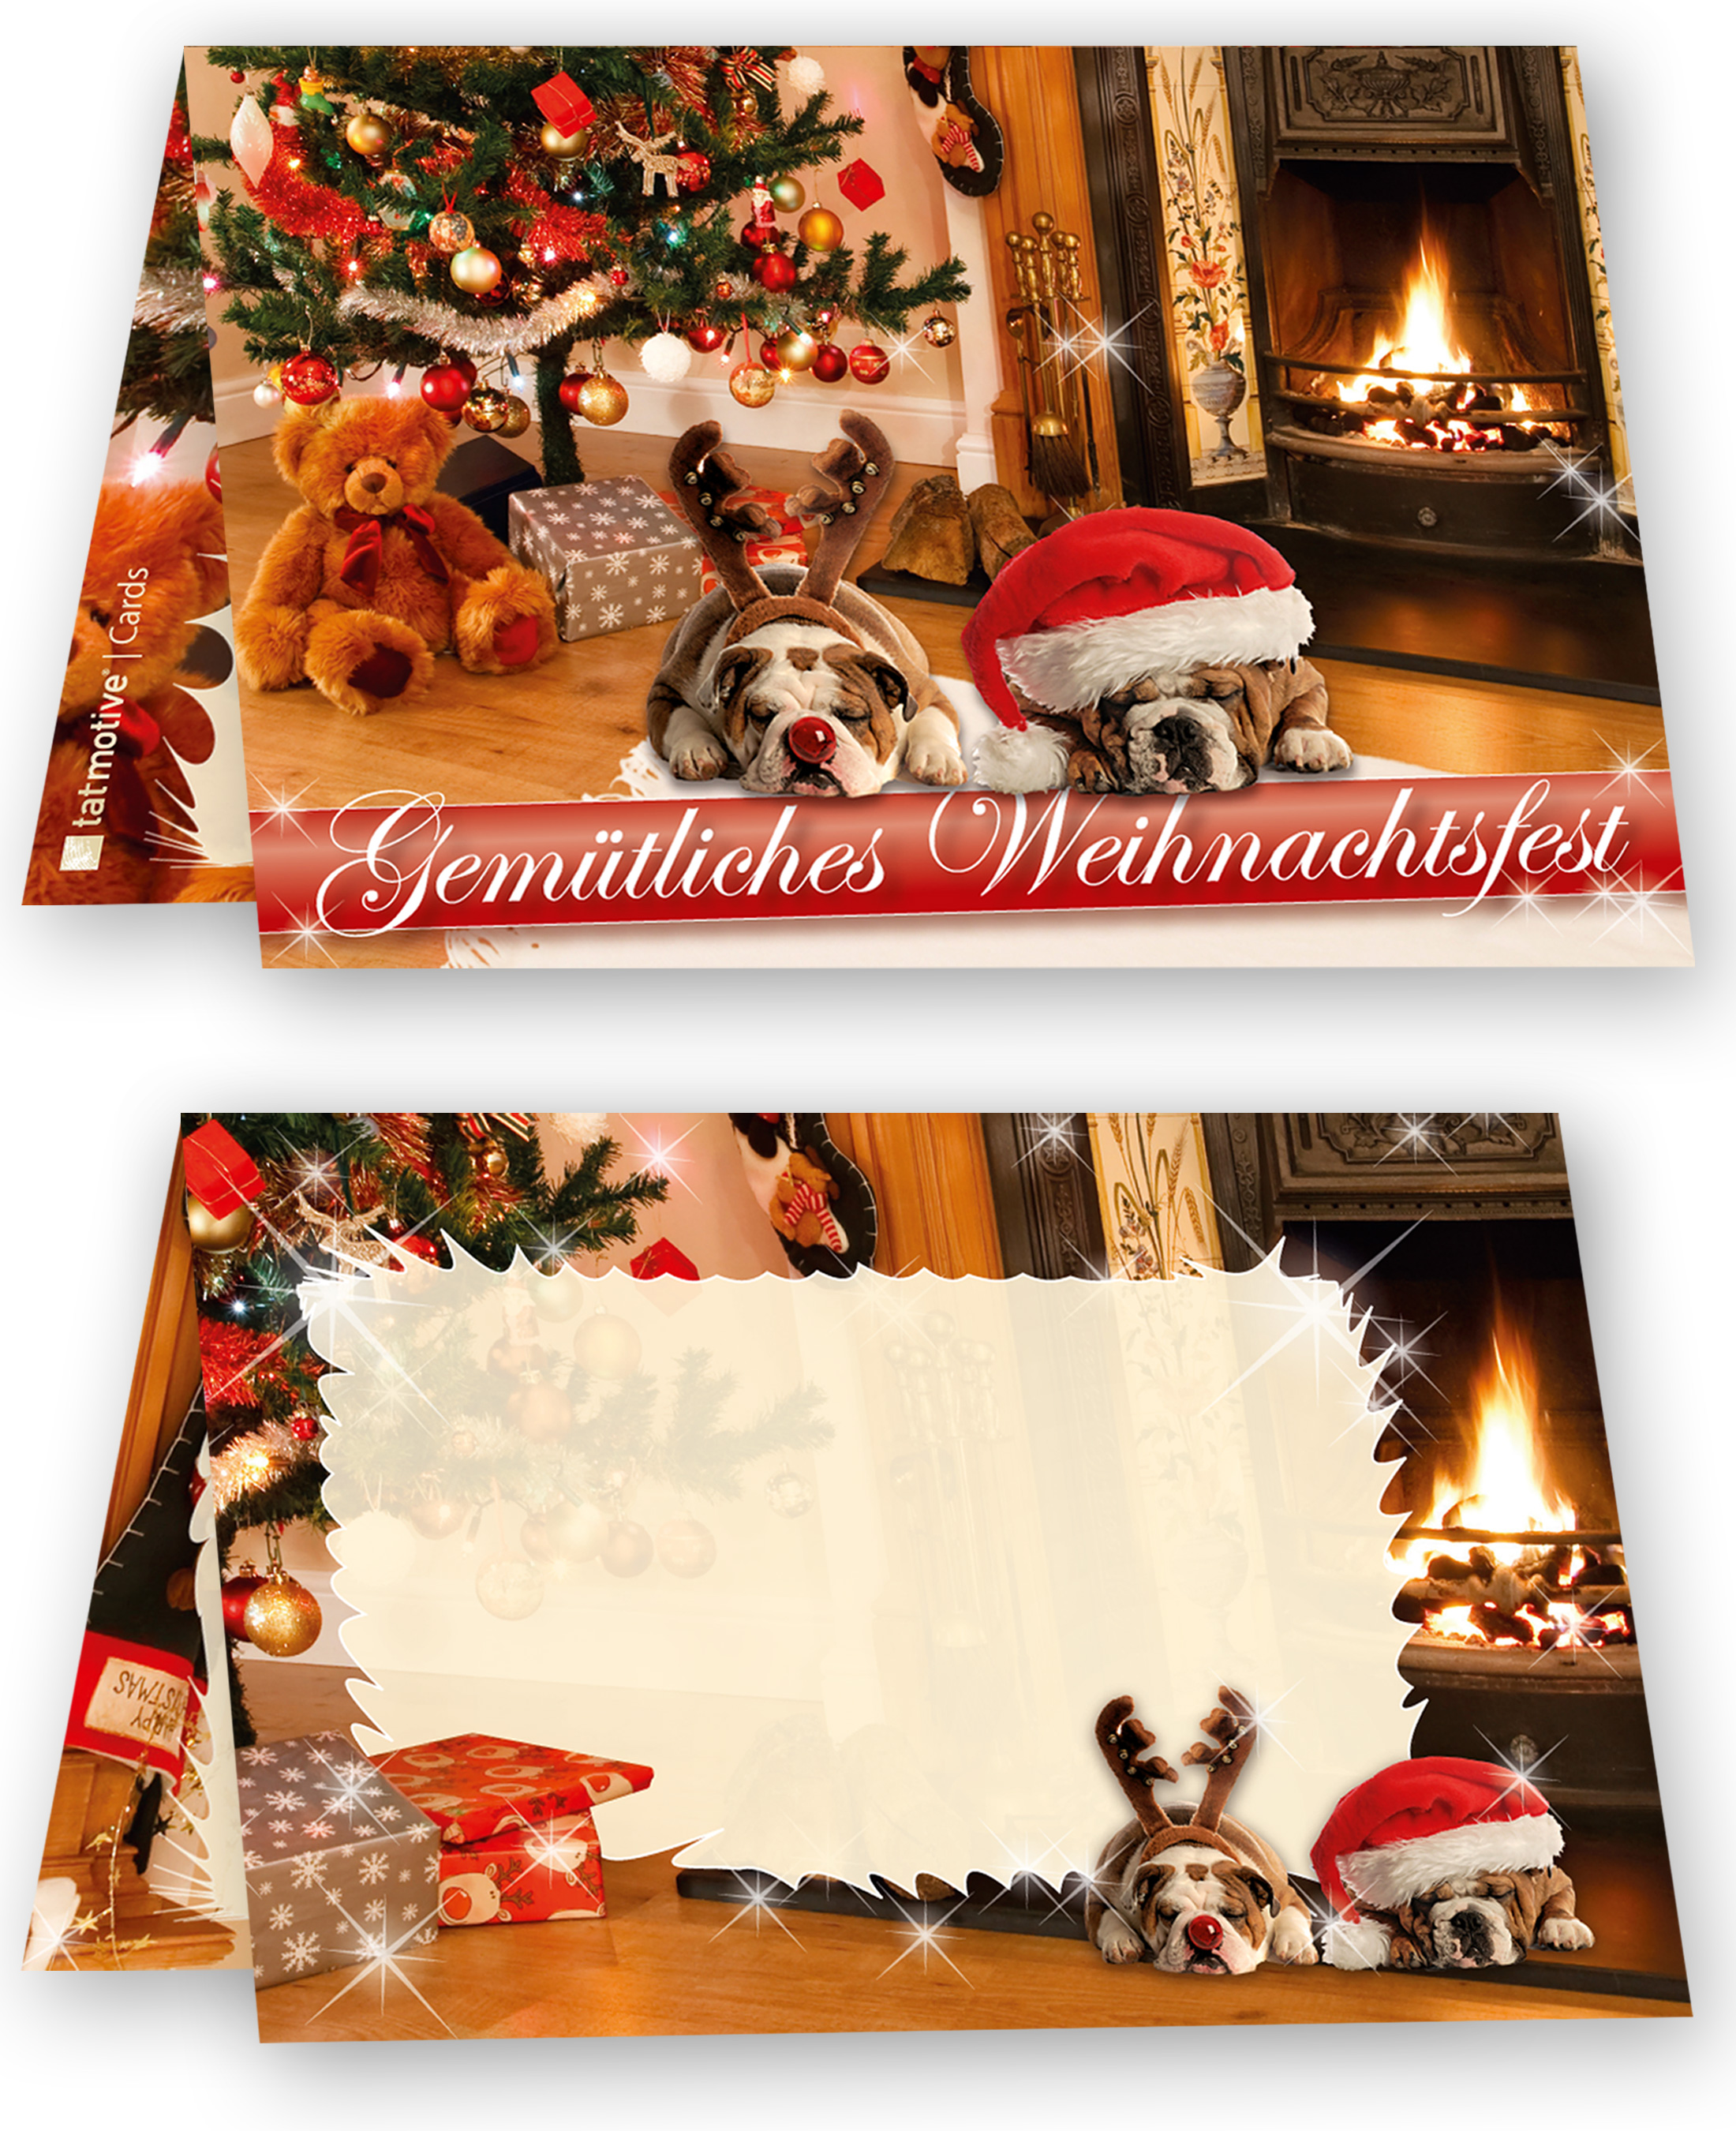 geschenkanh nger weihnachten lustig 50 st ck tischkarten. Black Bedroom Furniture Sets. Home Design Ideas